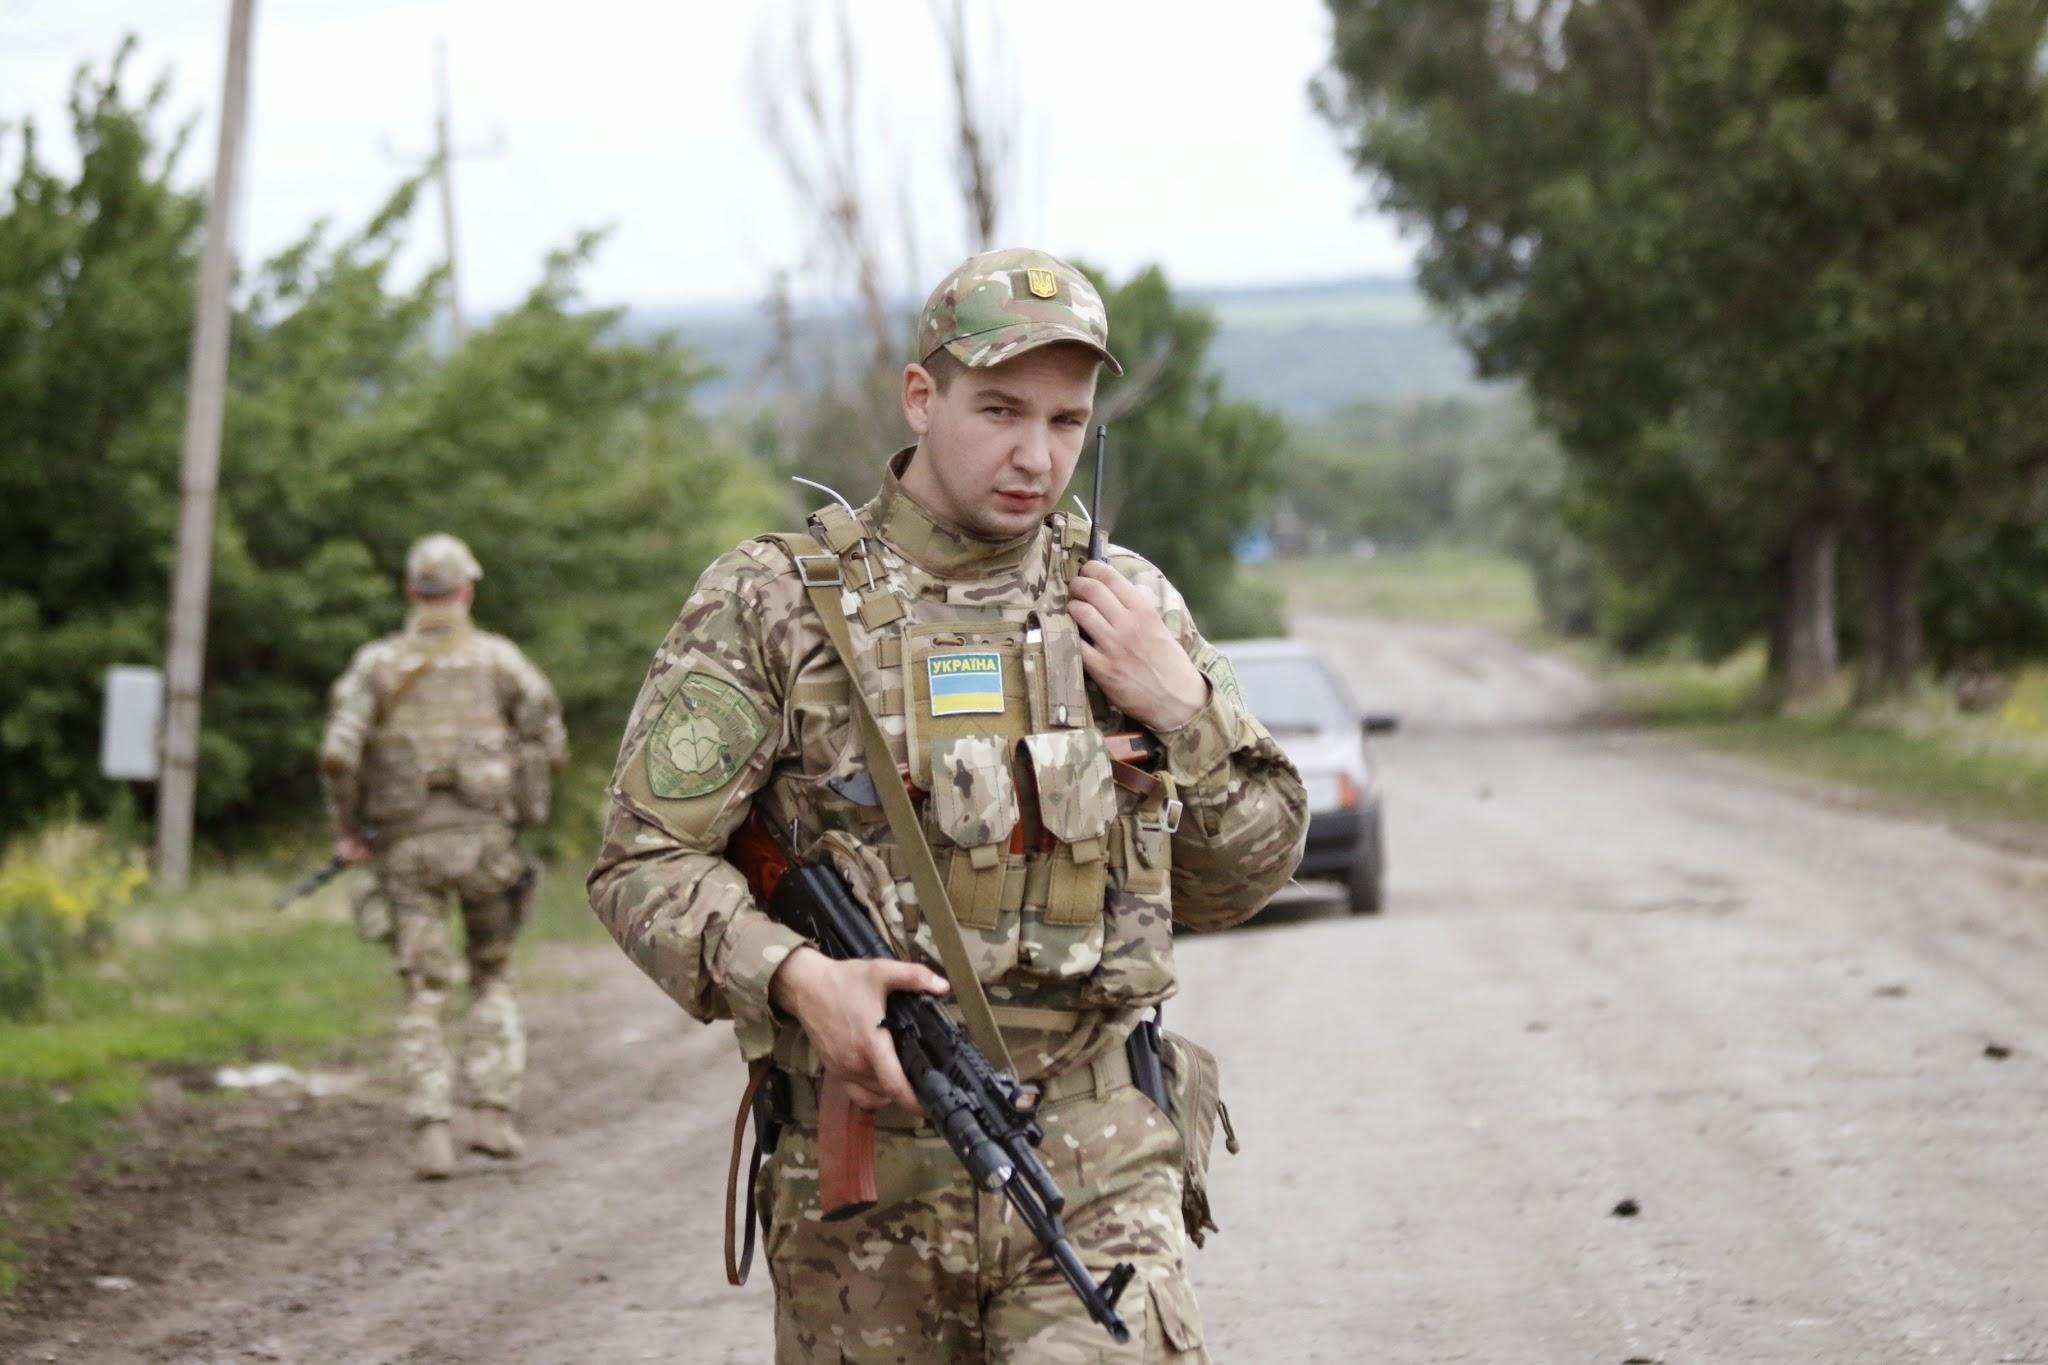 Occupied Ukraine: The Land of Make Believe